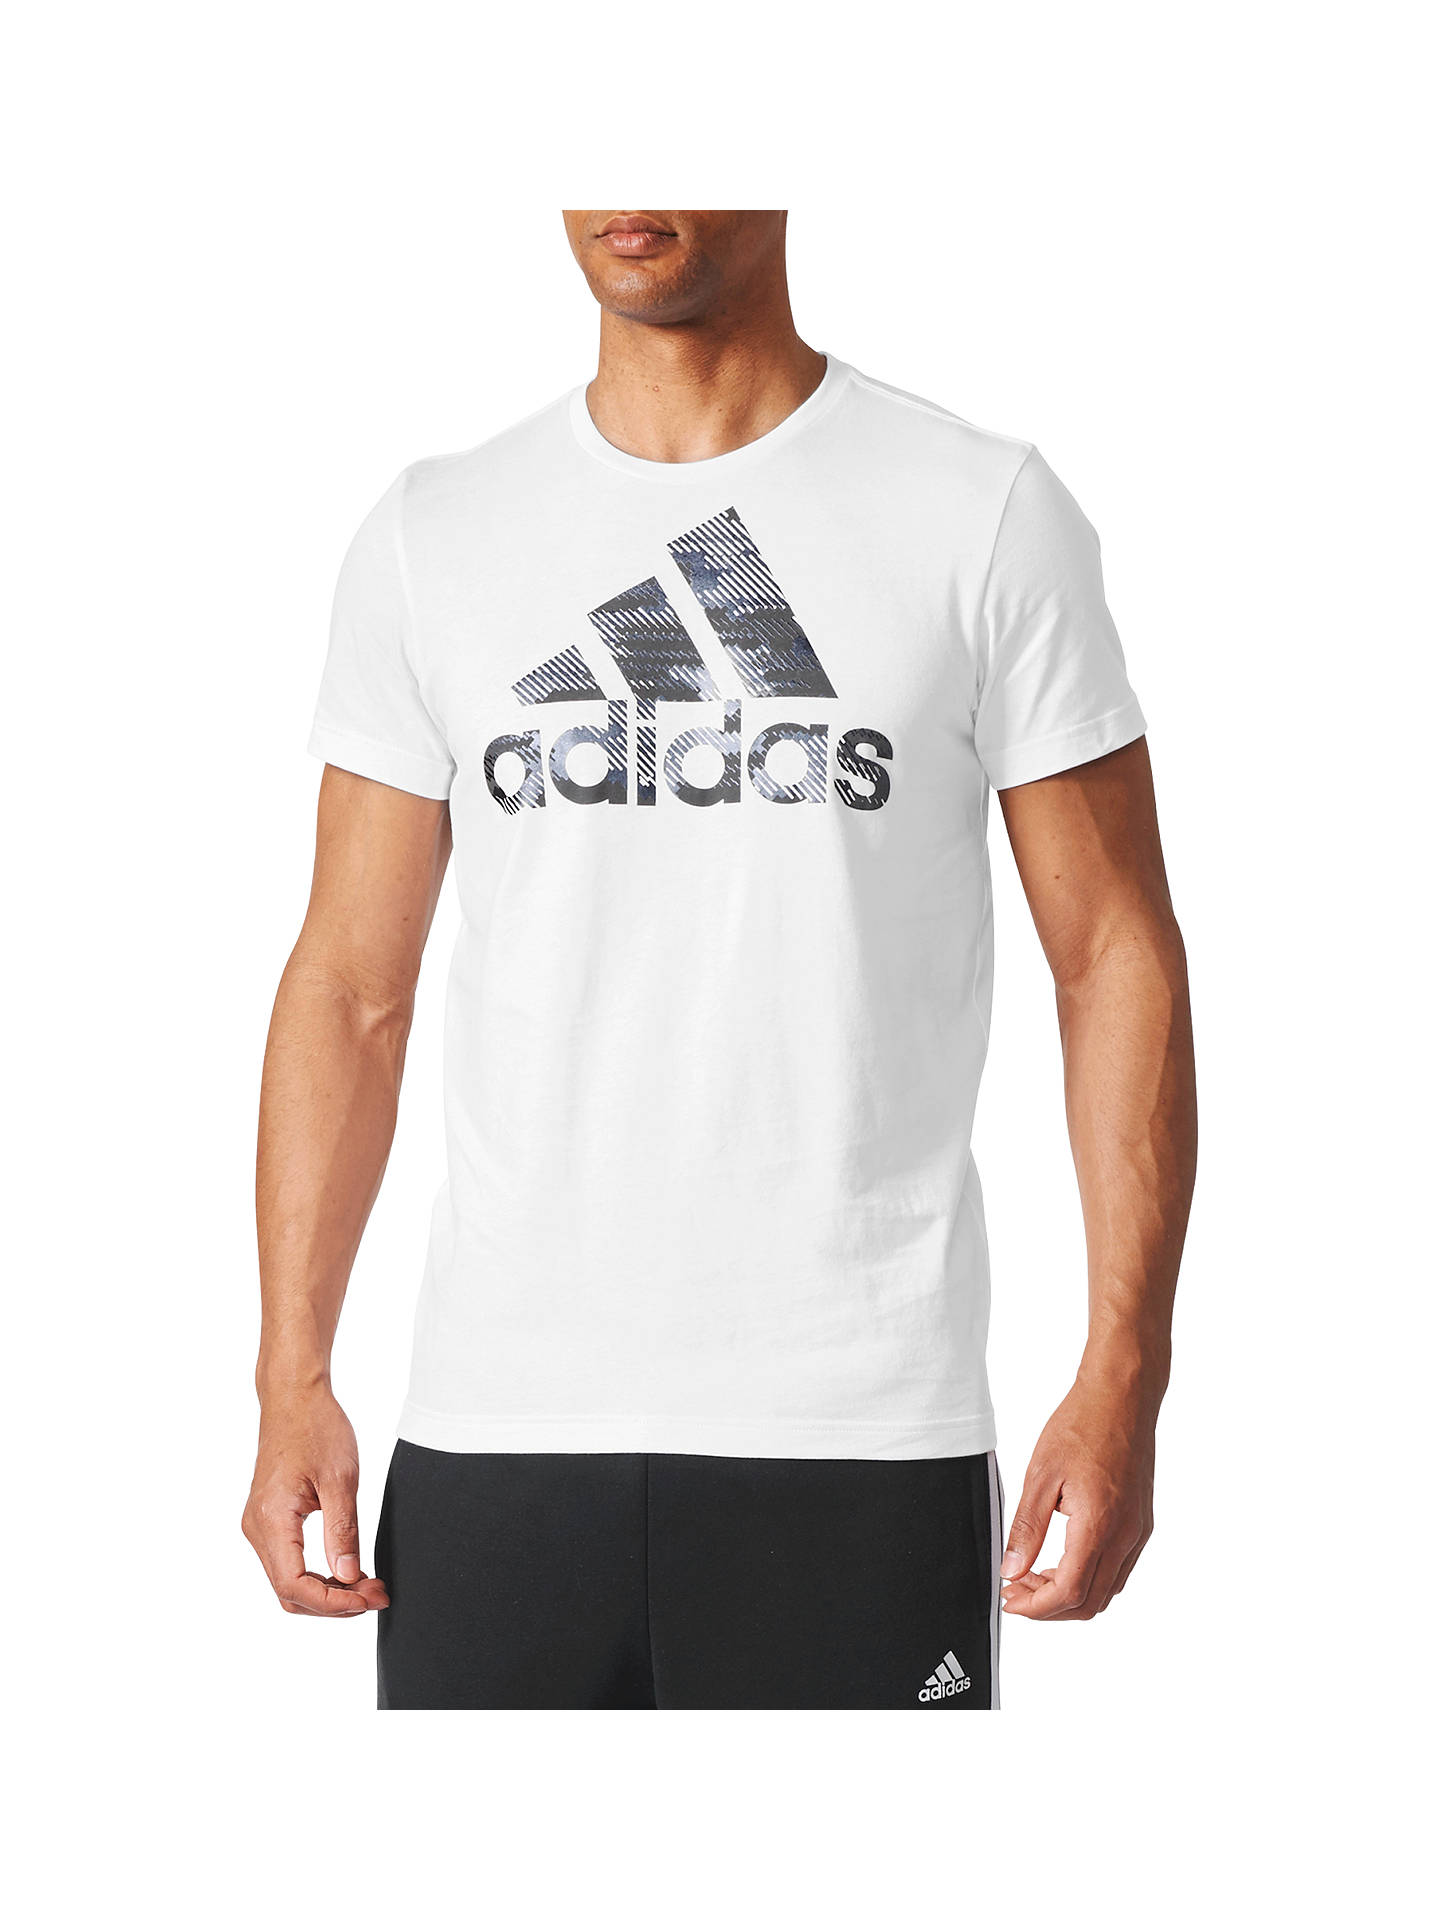 ad3bcb1c1254 Buy Adidas Essentials Badge of Sport Foil Logo T-Shirt